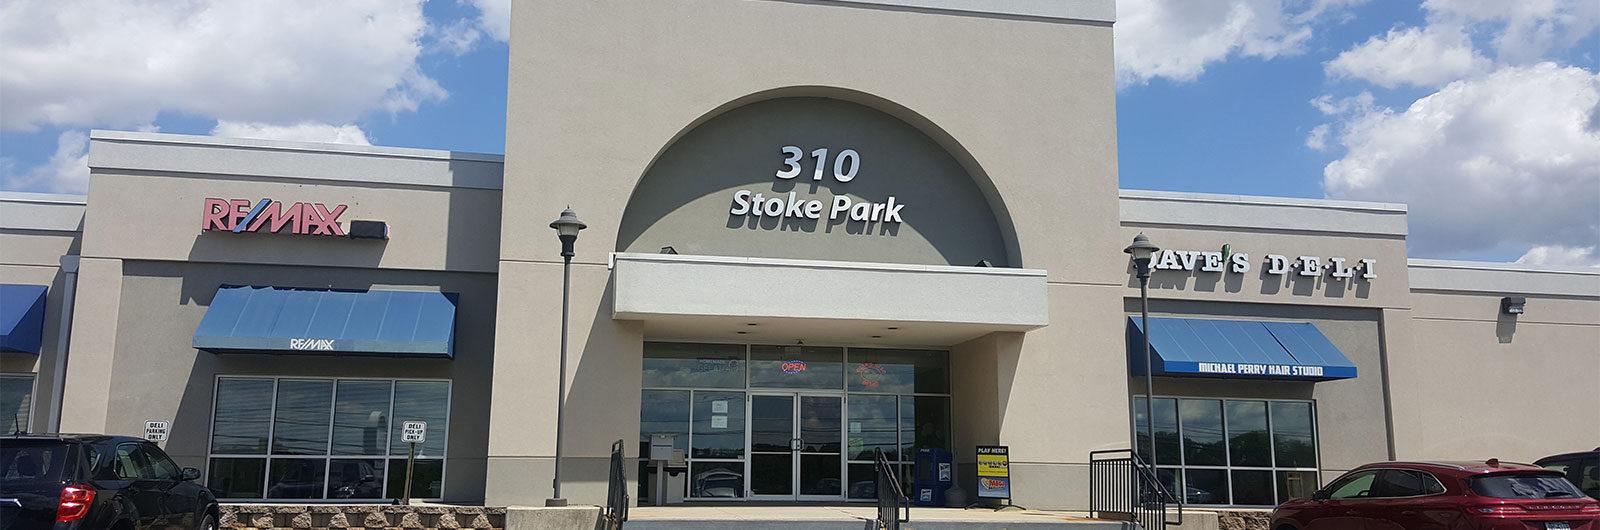 310 Stoke Park Road